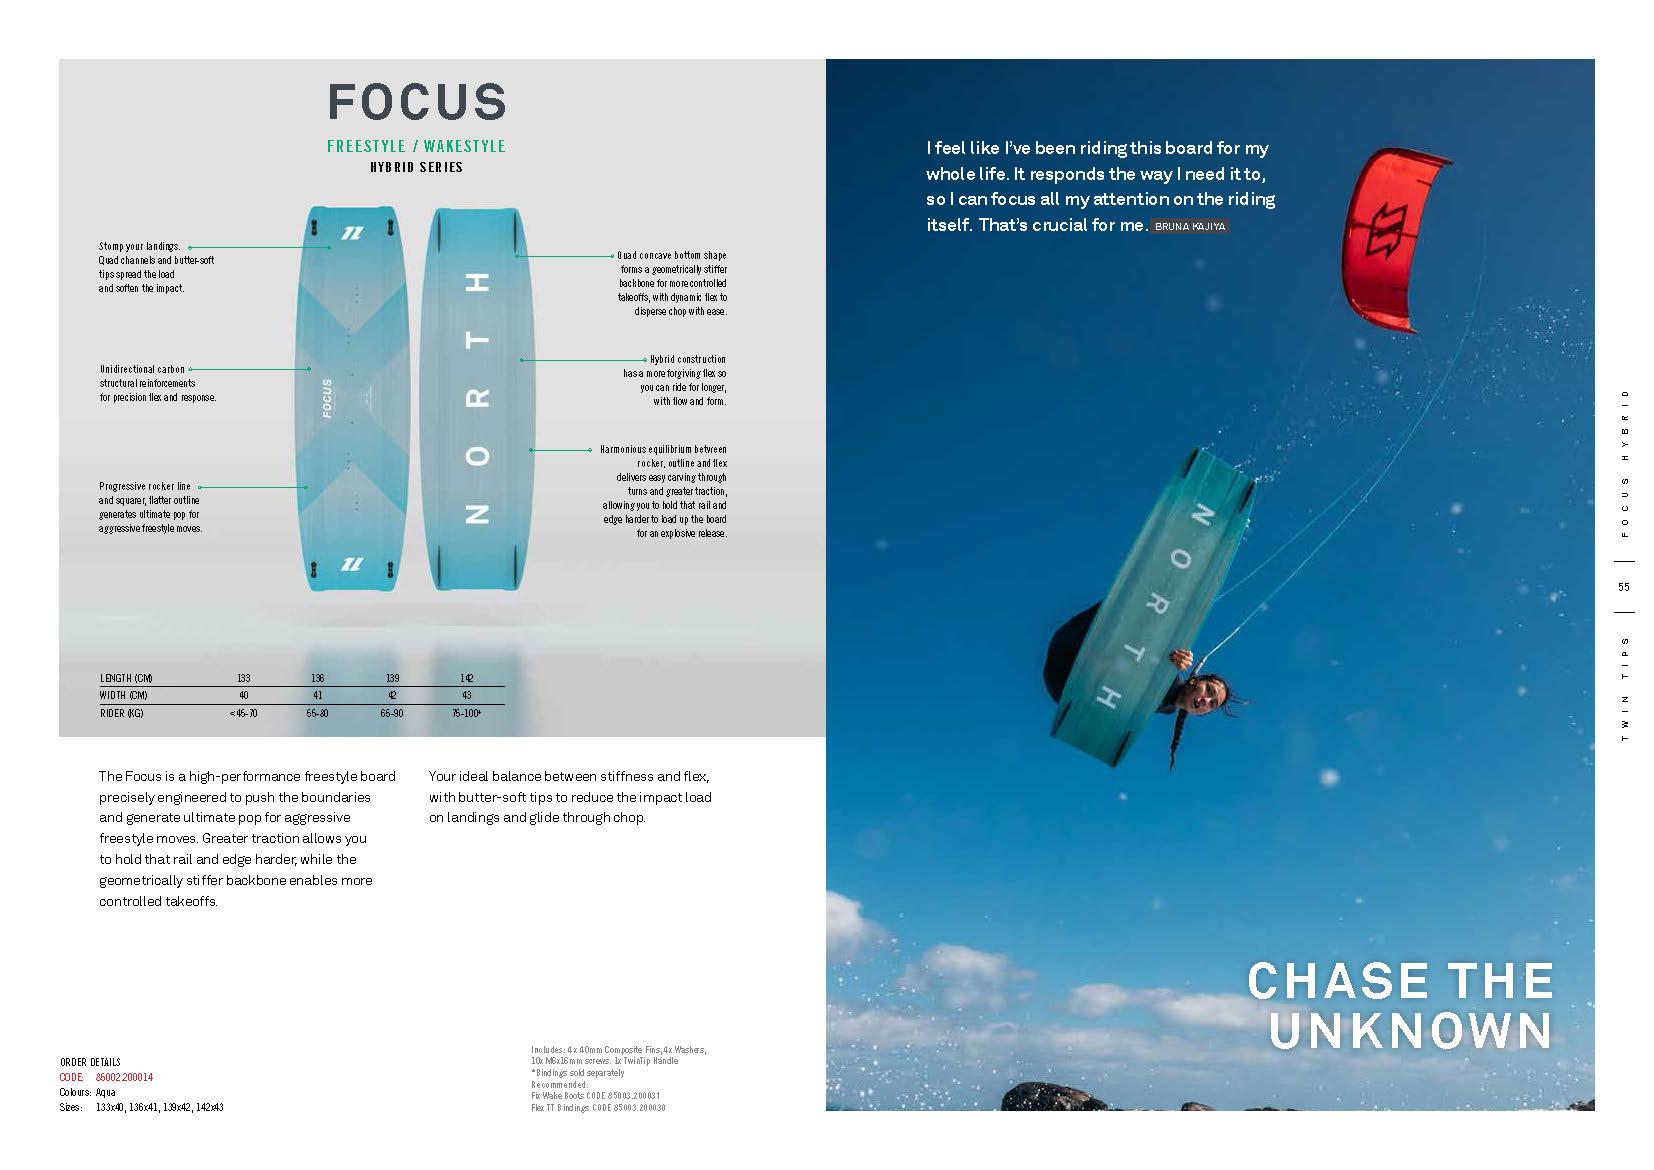 FOCUS planche de kite north 2020